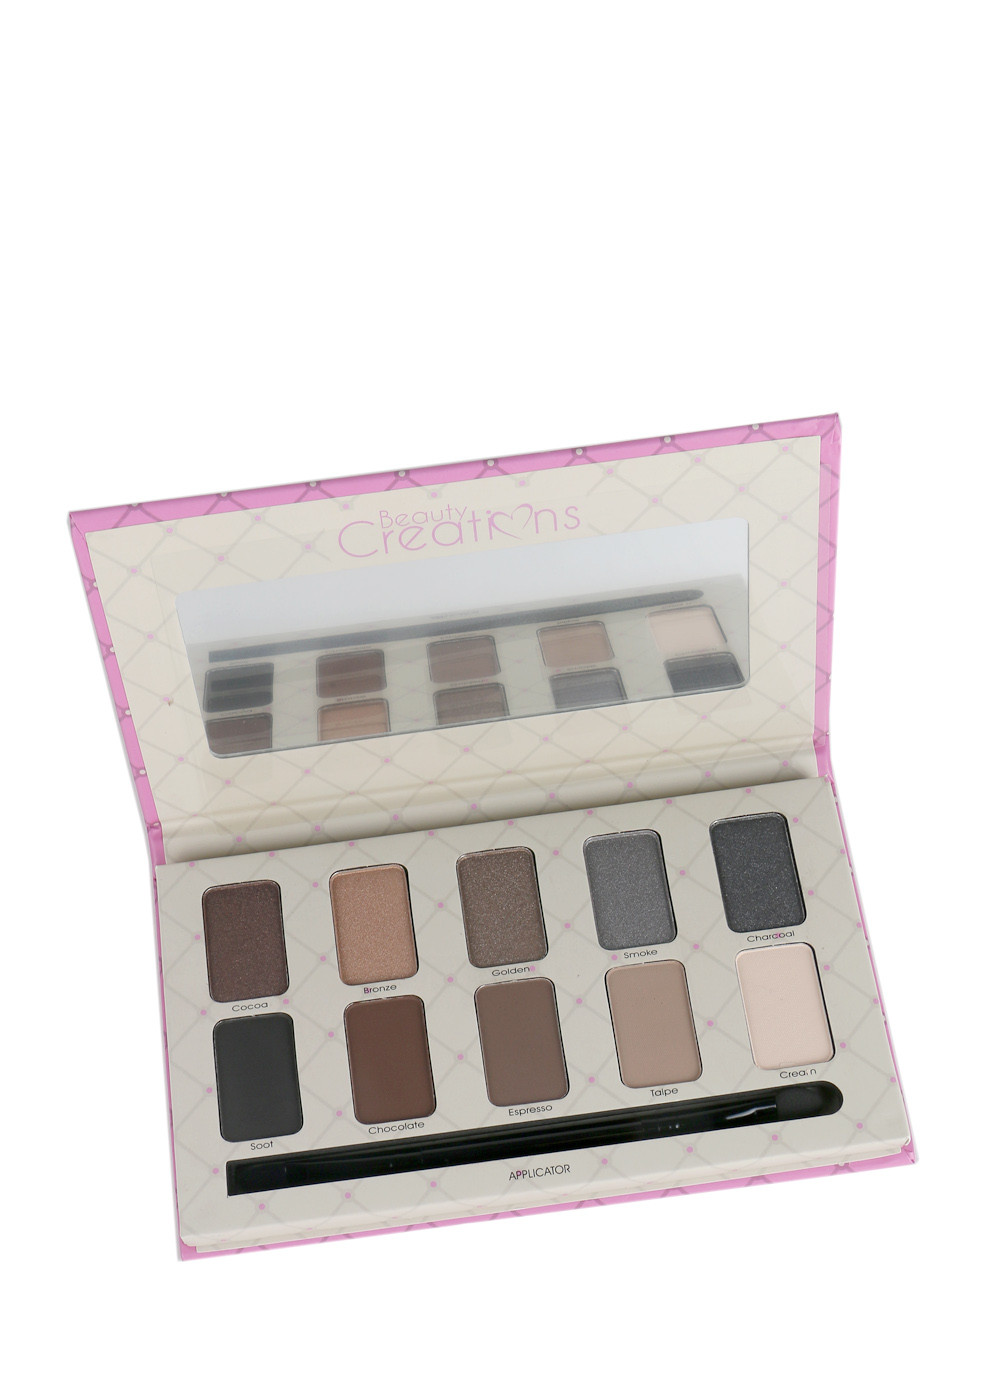 Jacqueline Deviante Cosmetics Beauty Creations Angel Glow Highlight Palette E10d 3600 Tease Nude 12 Pcs 1